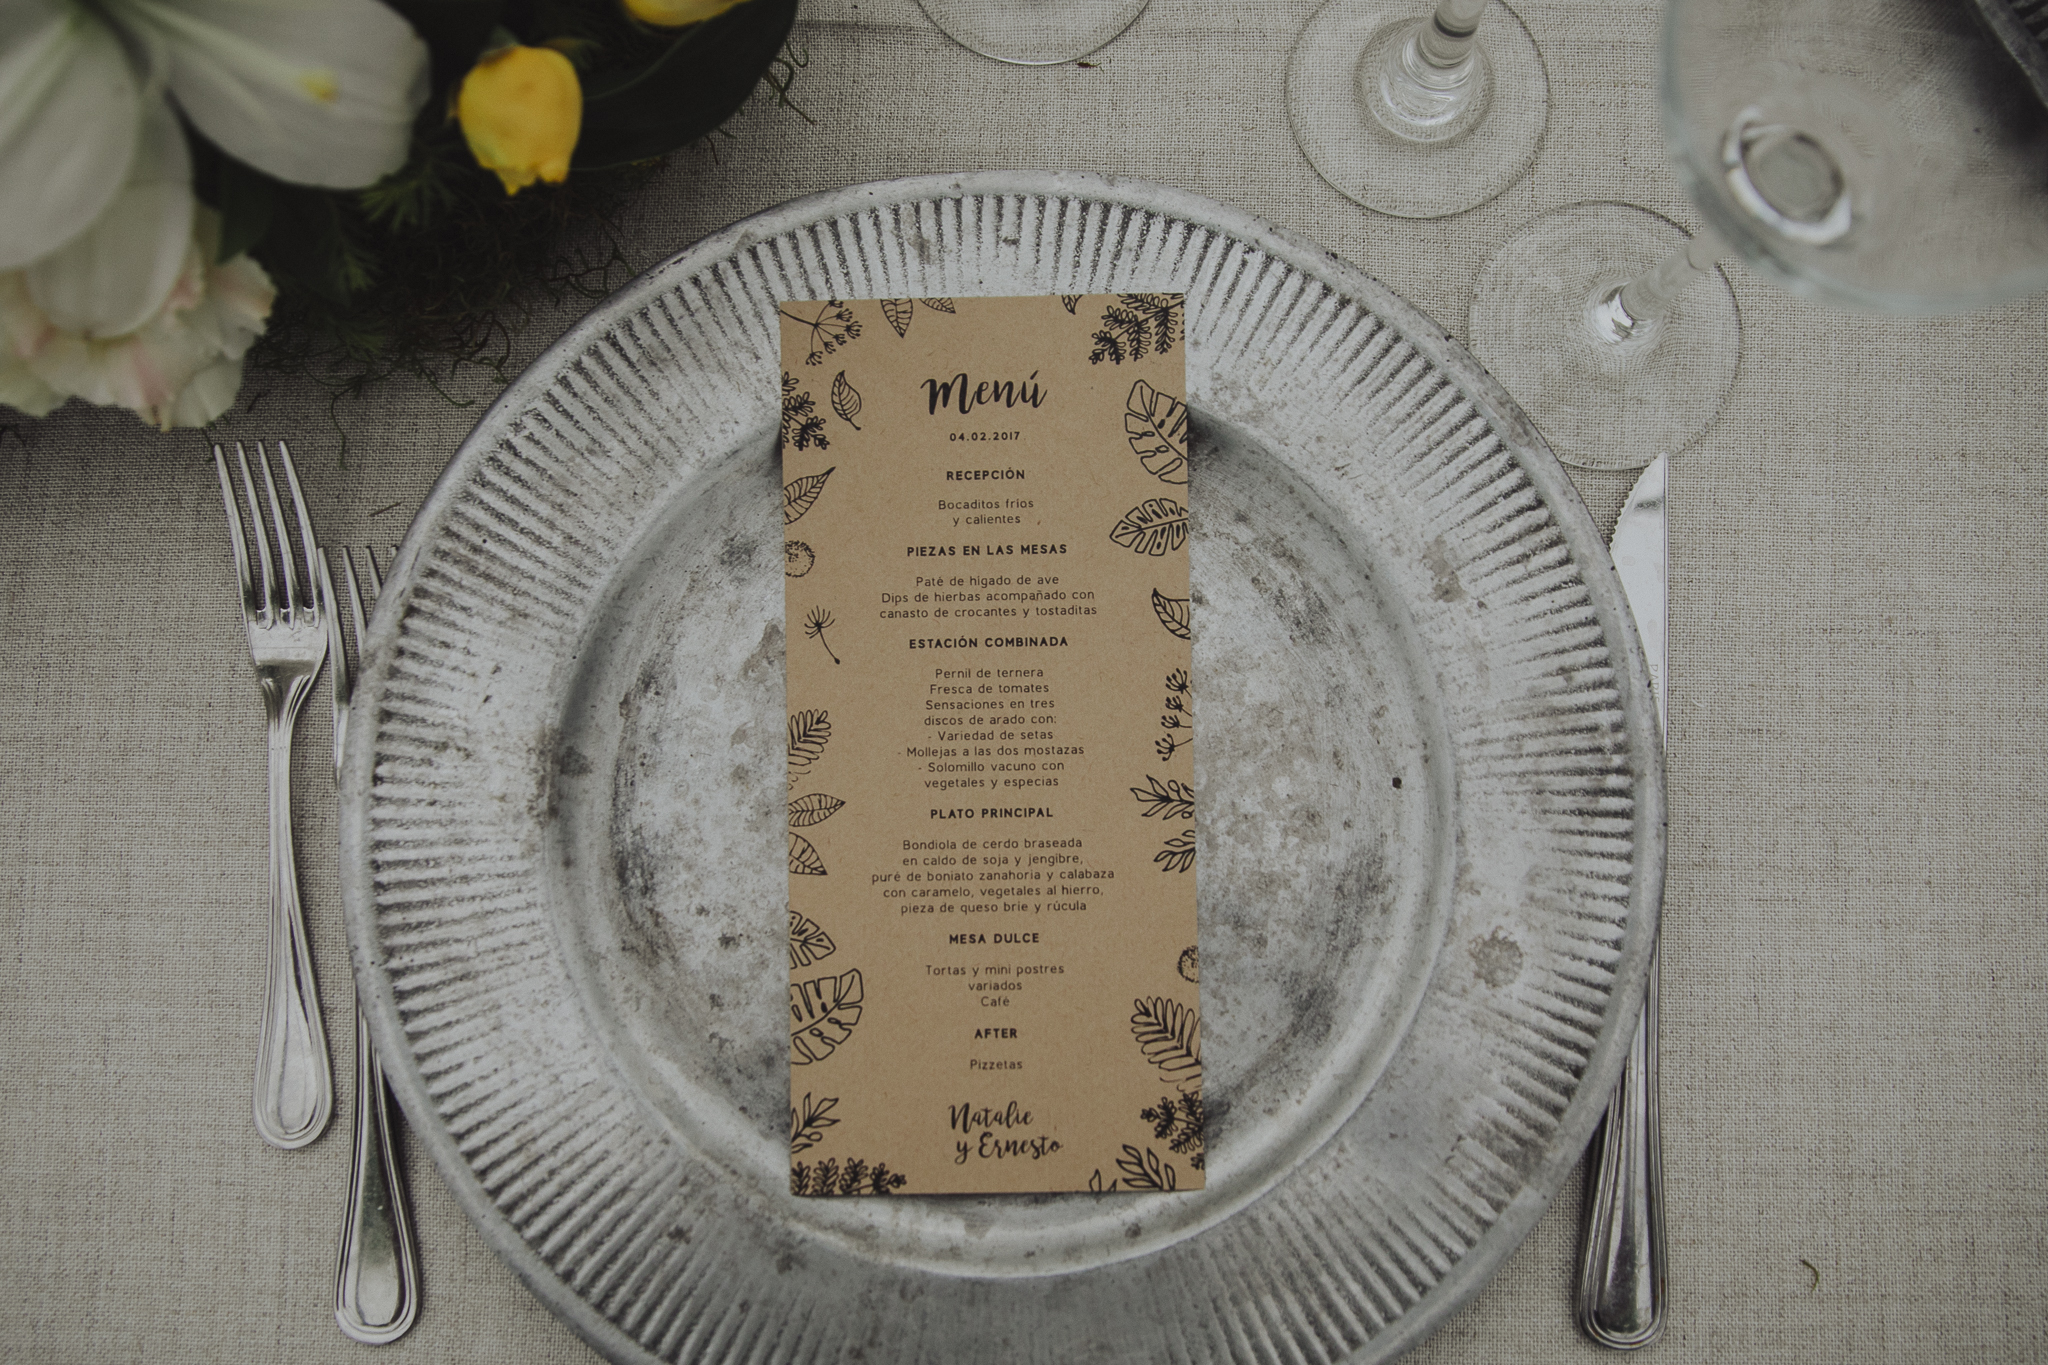 invitaciones de boda - membrete -montevideo, uruguay - nye